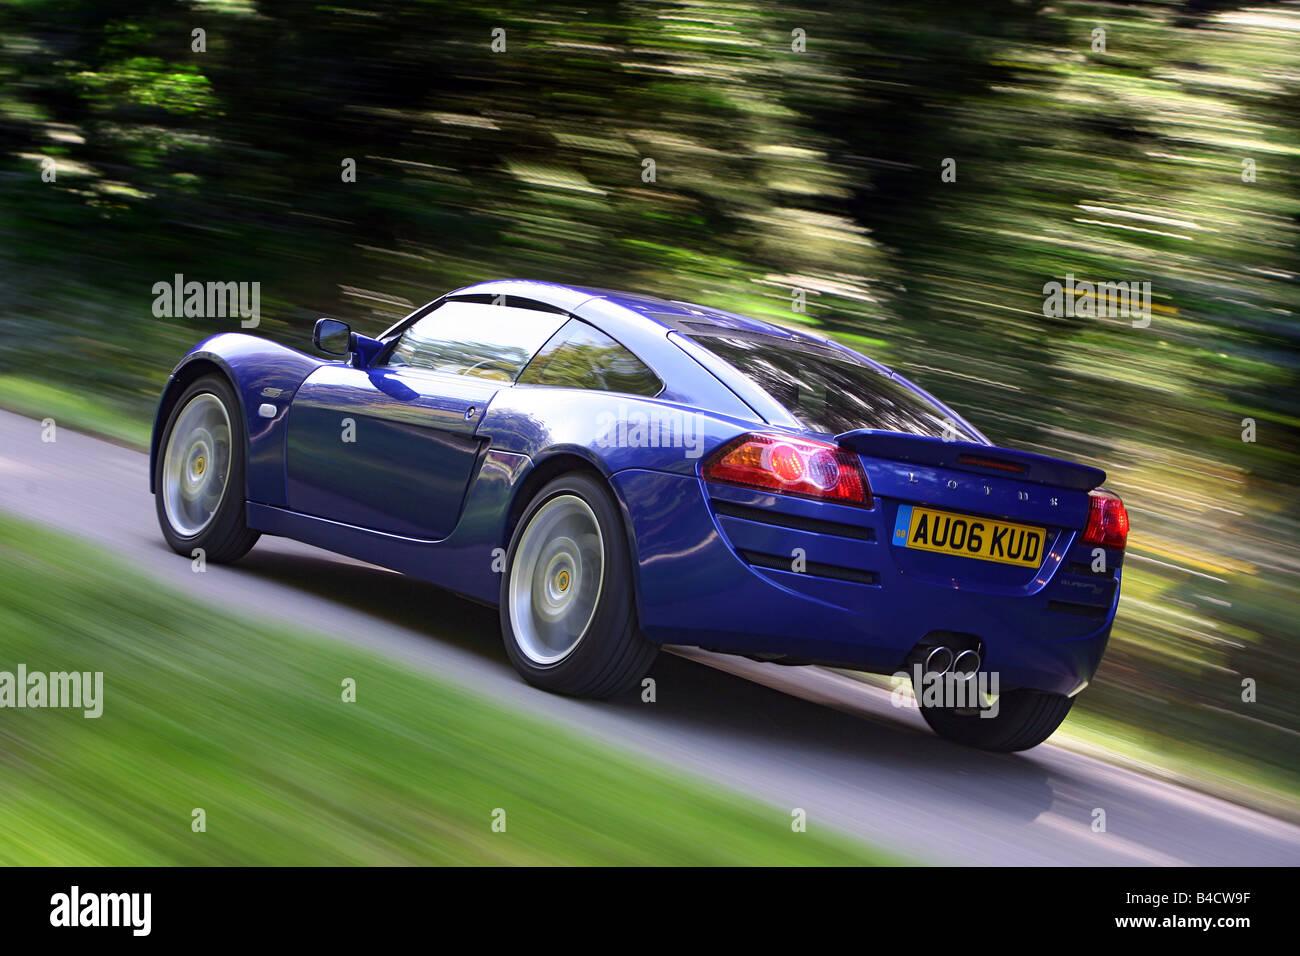 https://c8.alamy.com/comp/B4CW9F/lotus-europa-s-model-year-2006-blue-moving-diagonal-from-the-back-B4CW9F.jpg